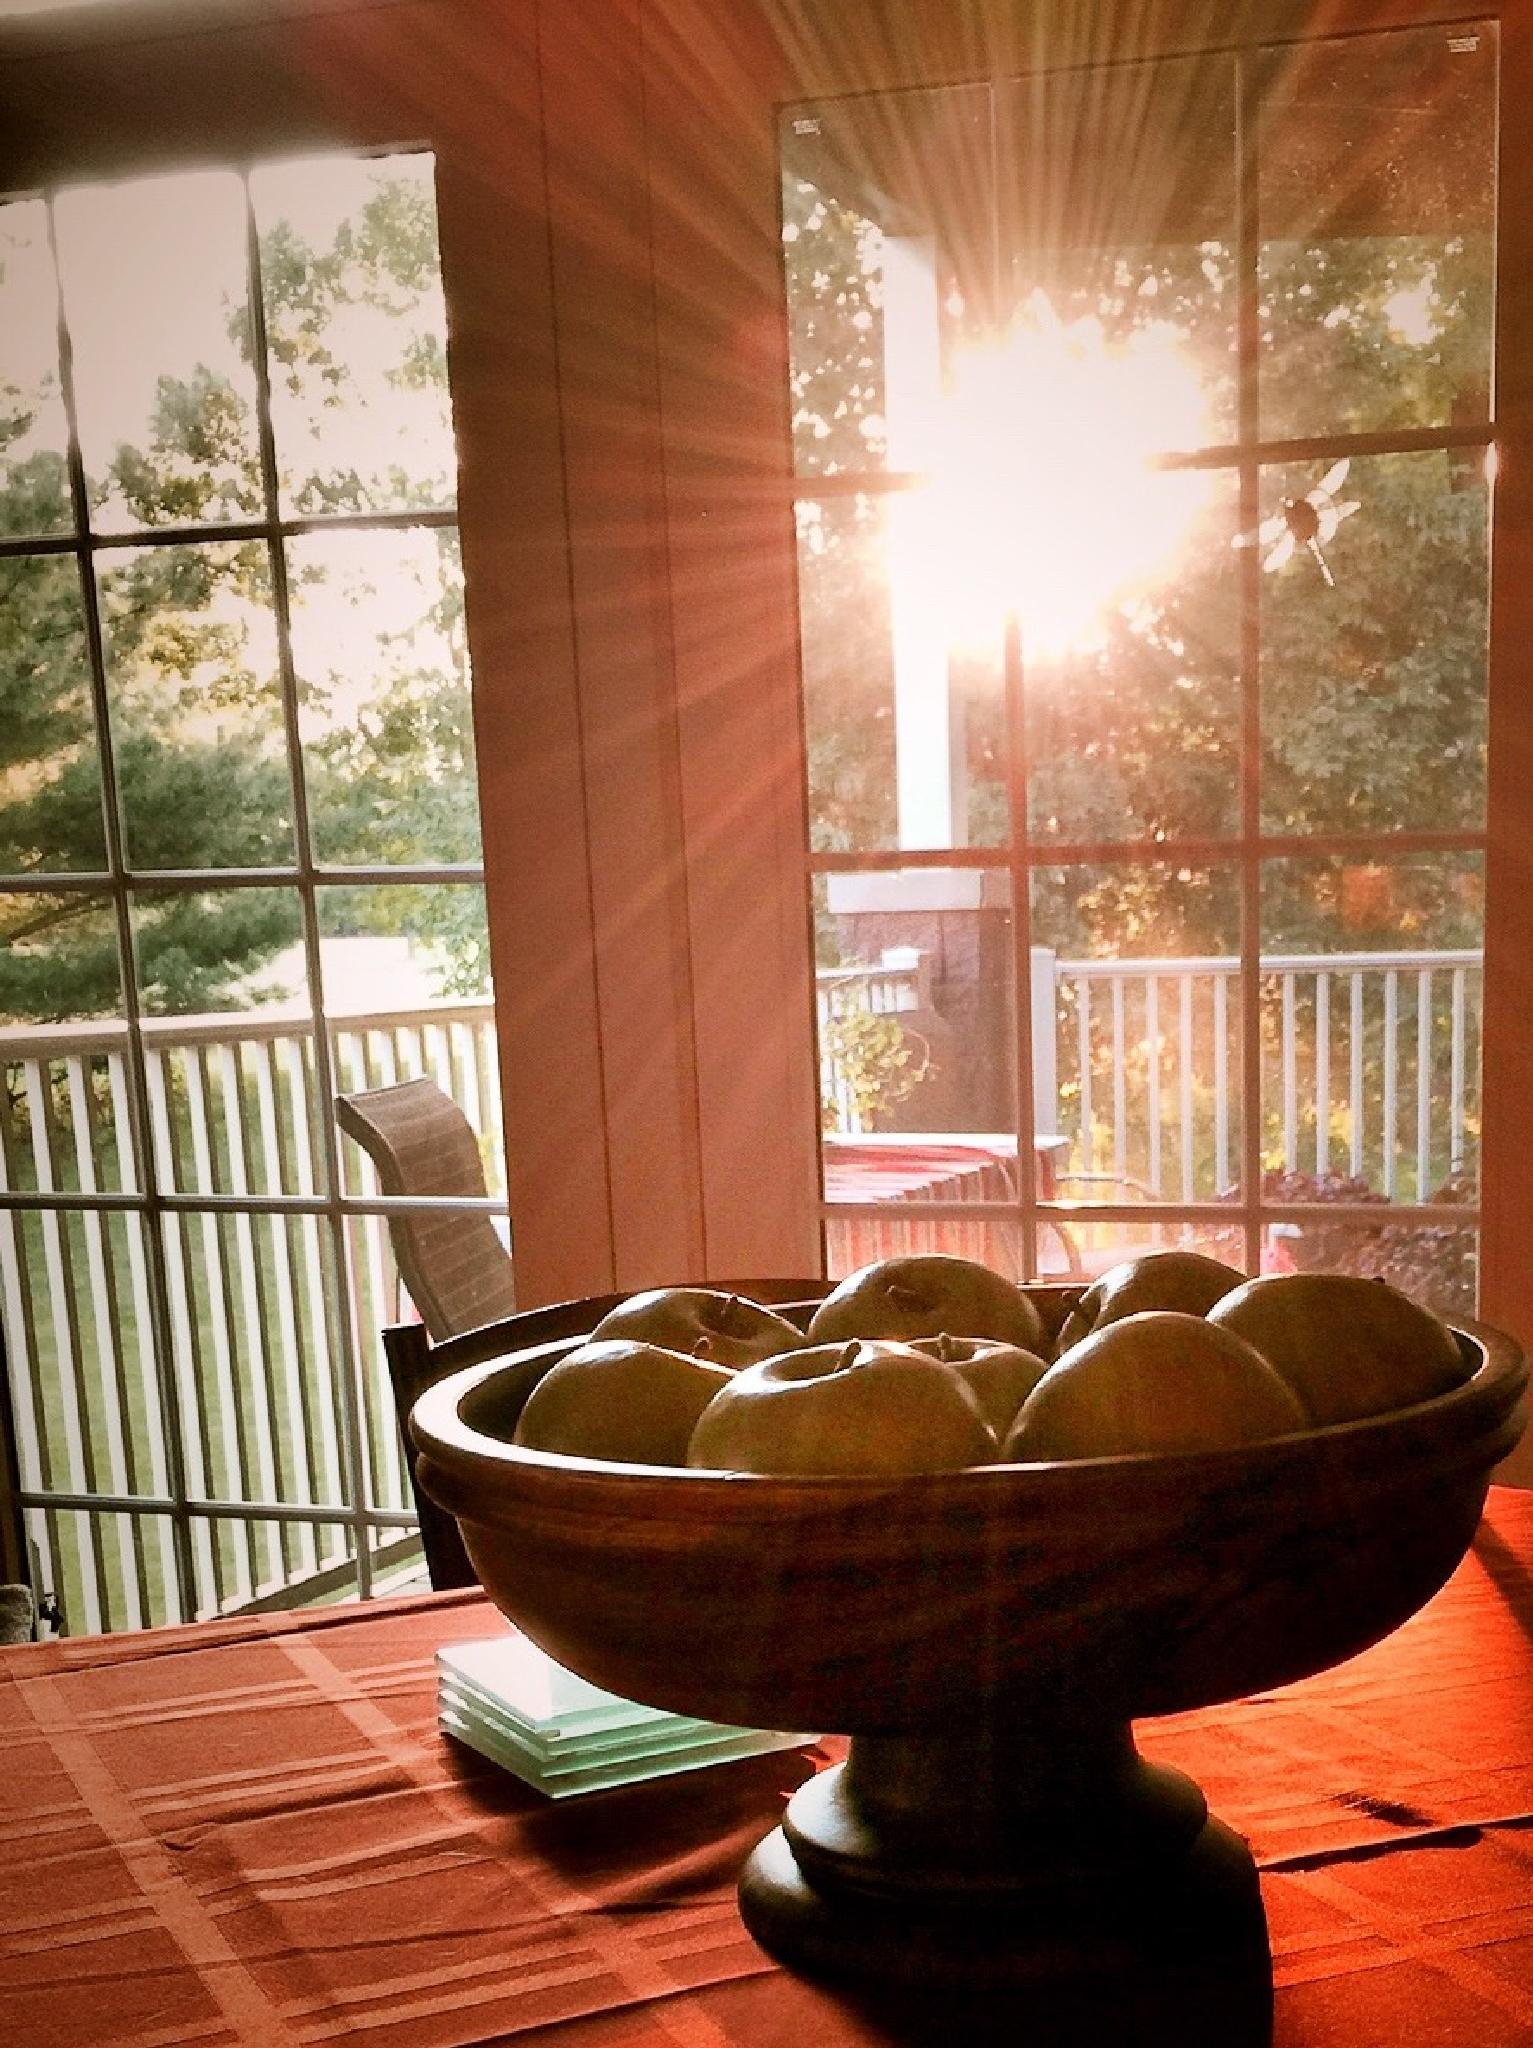 Good Morning, Sunshine! by Susan Wood